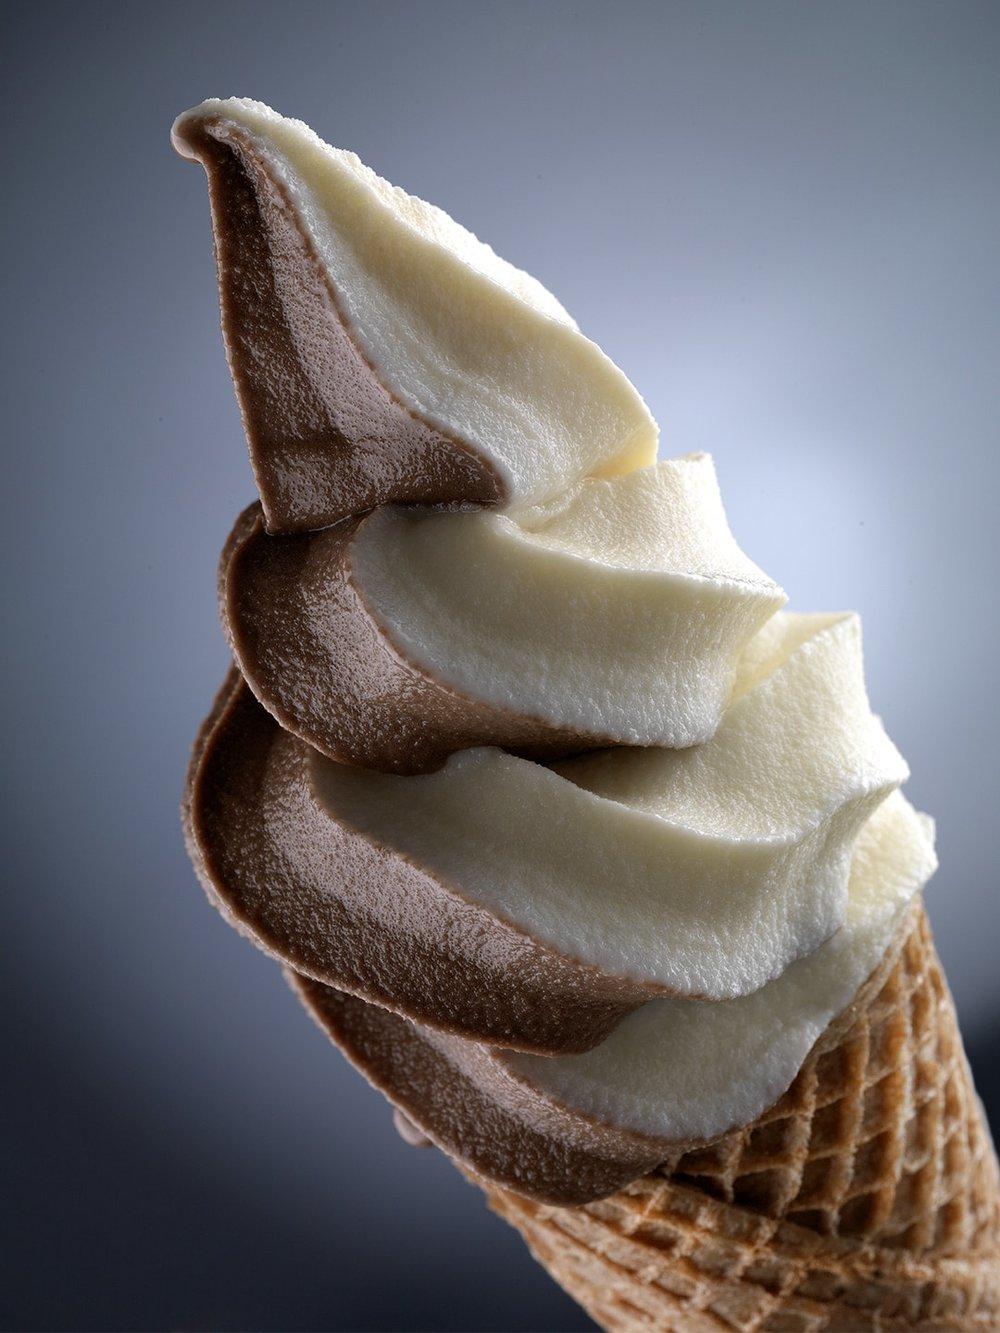 vainilla-chocolate-food-photography-miami-marcel-boldu.jpg